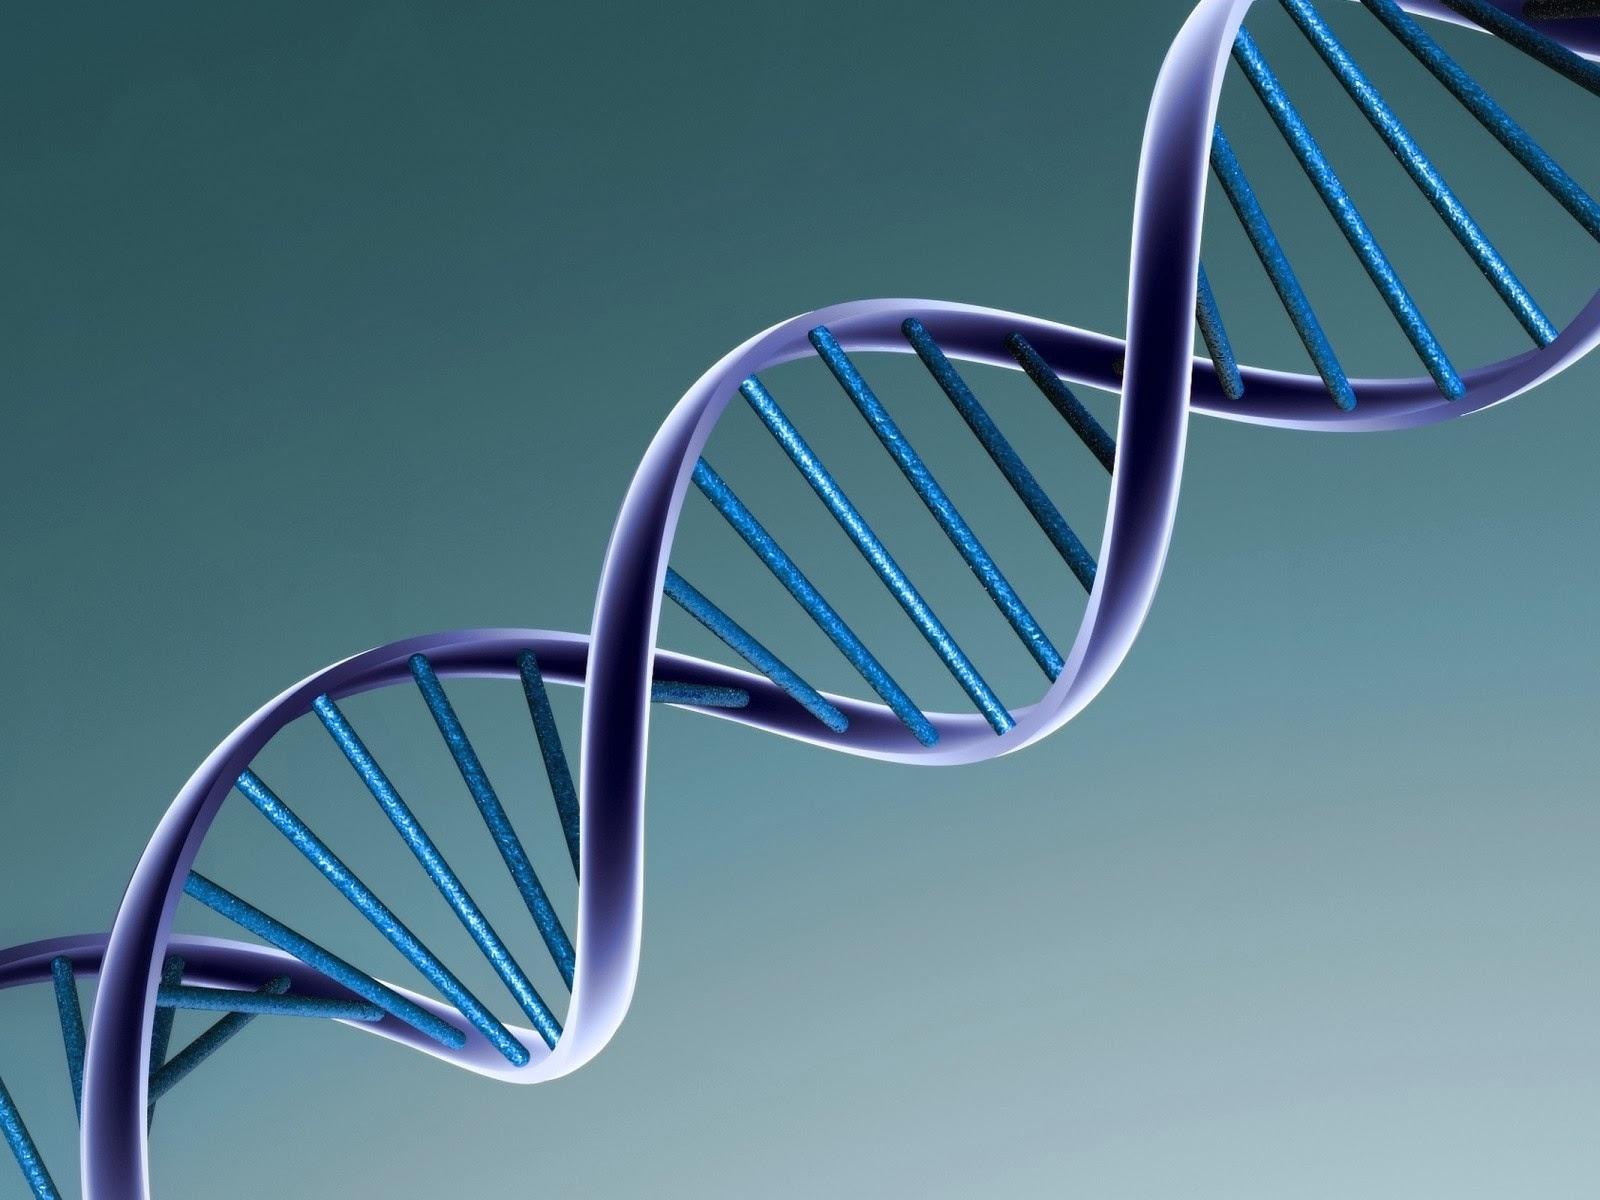 Gen Mcl-1 futuros tratamientos lupus. Revista infolupus